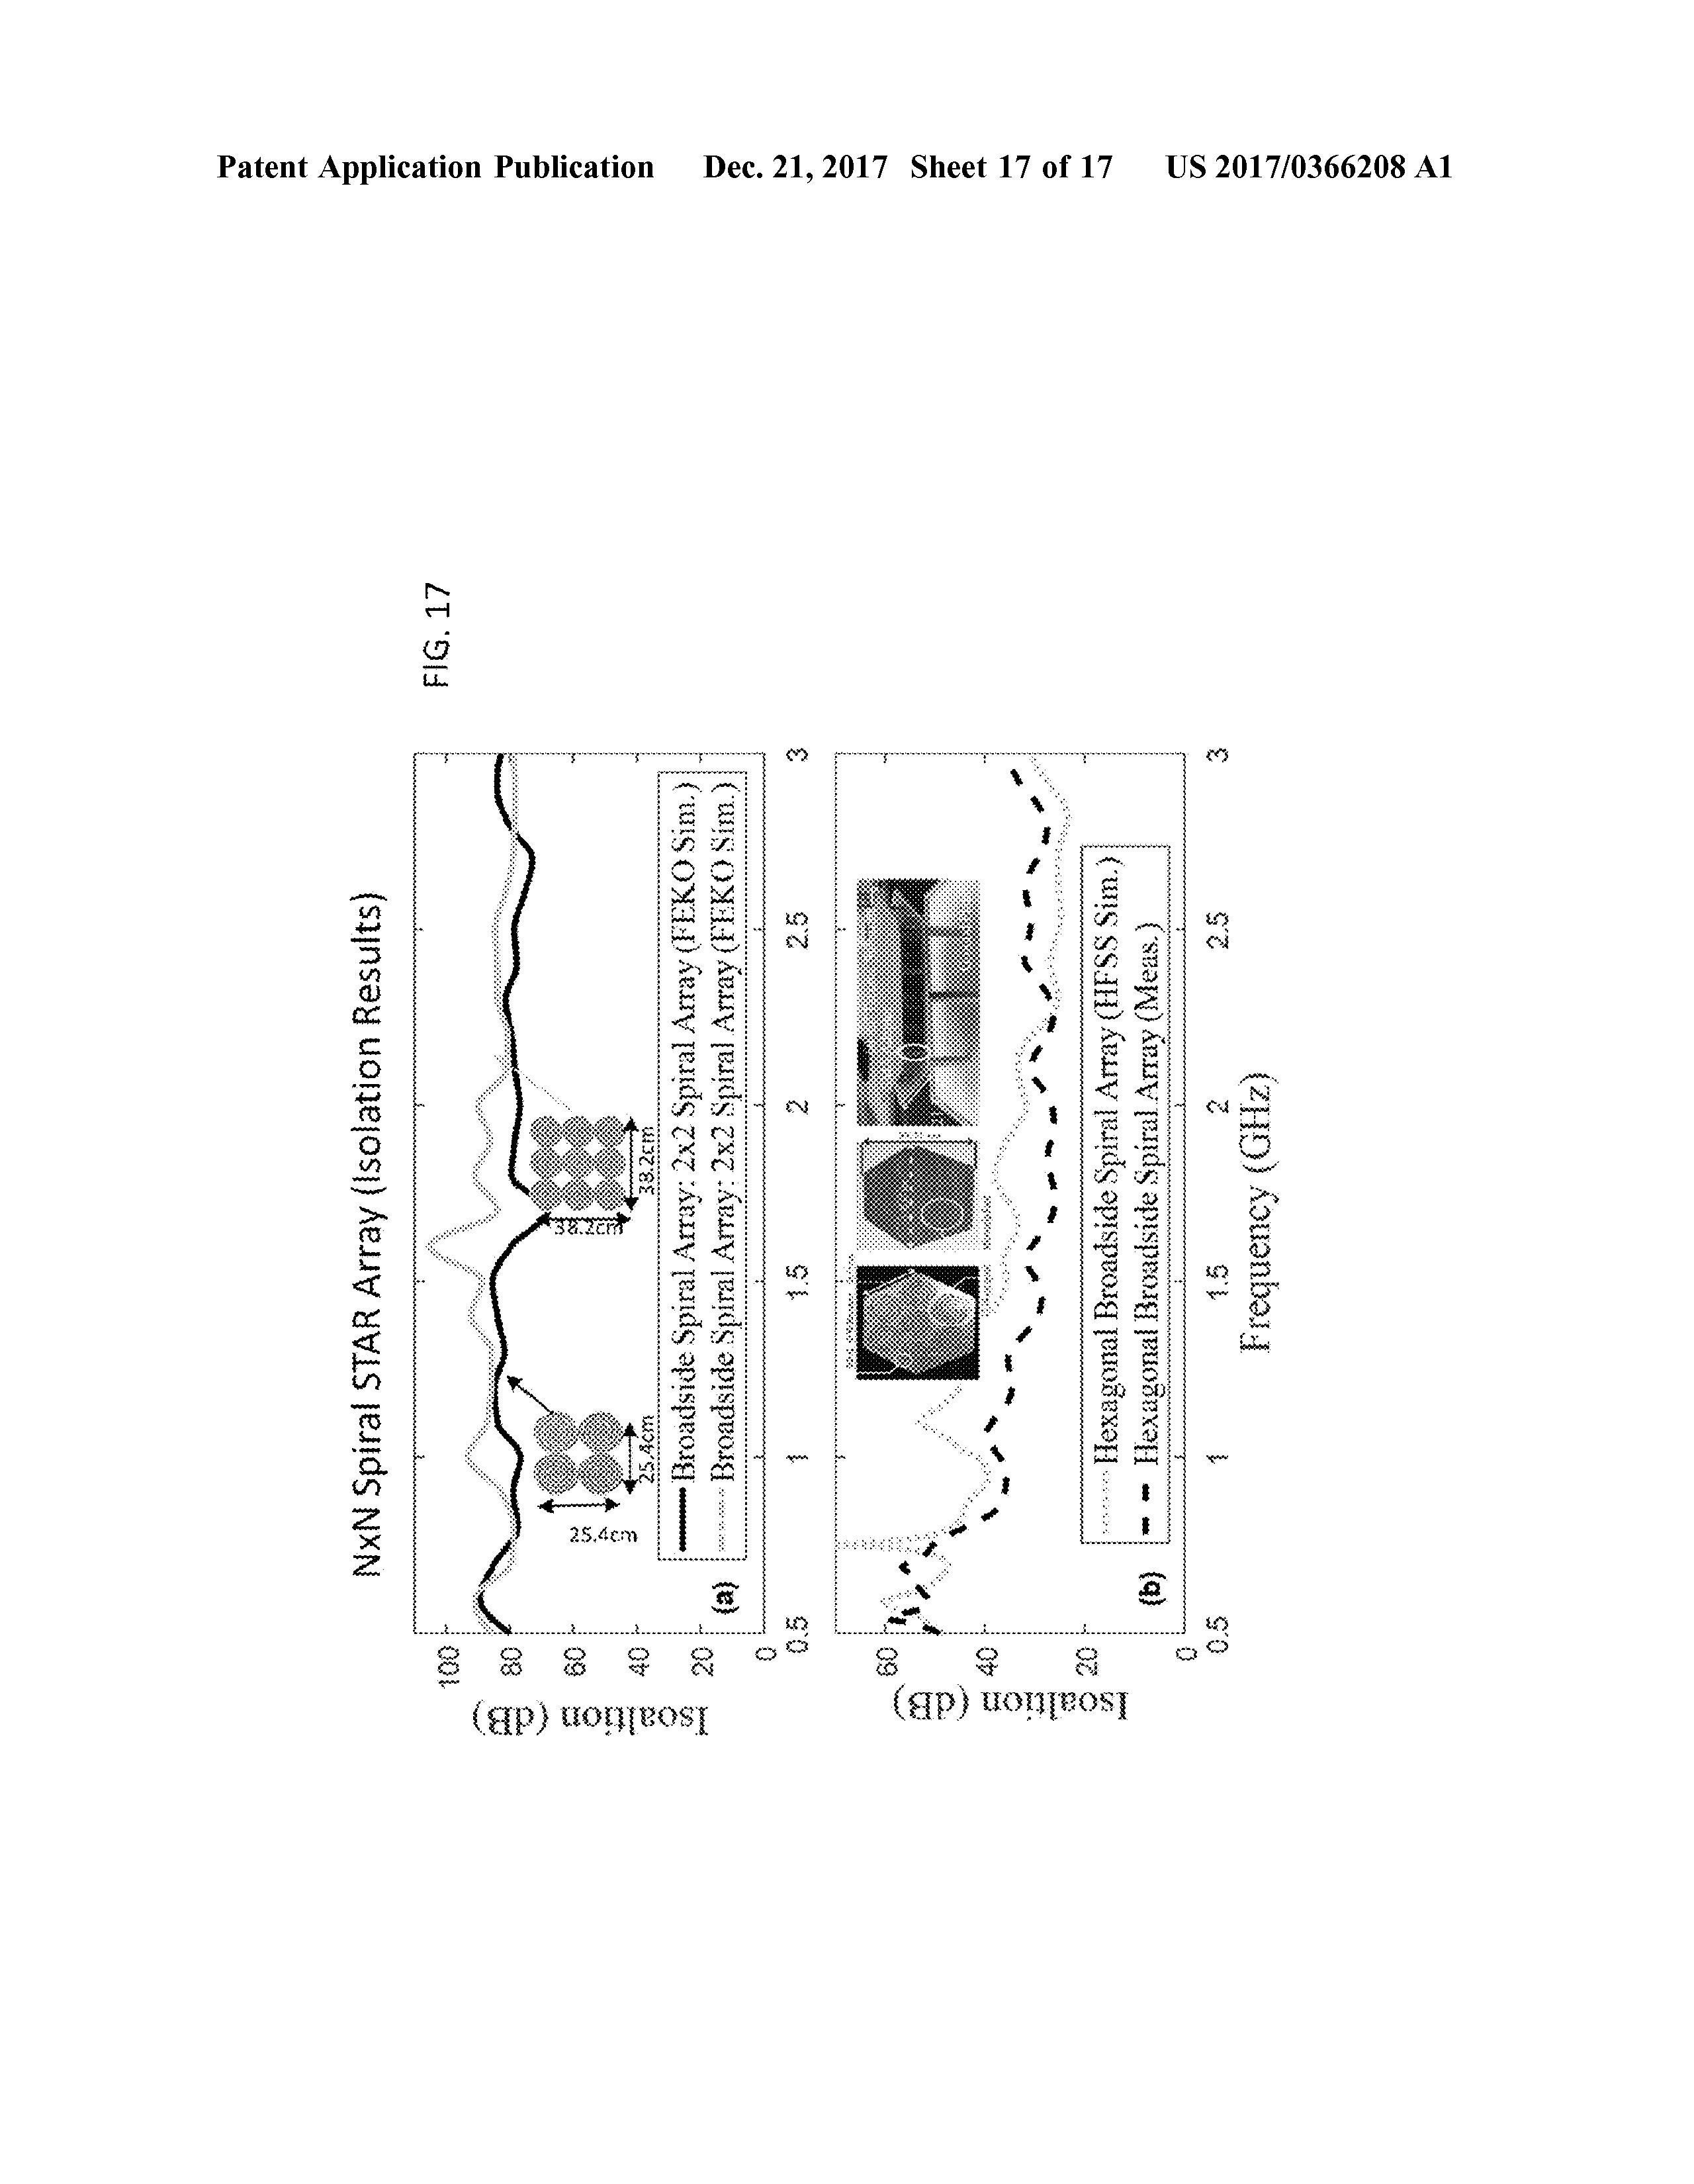 US 2017/0366208 A1 - Ultrawideband Co-polarized Simultaneous